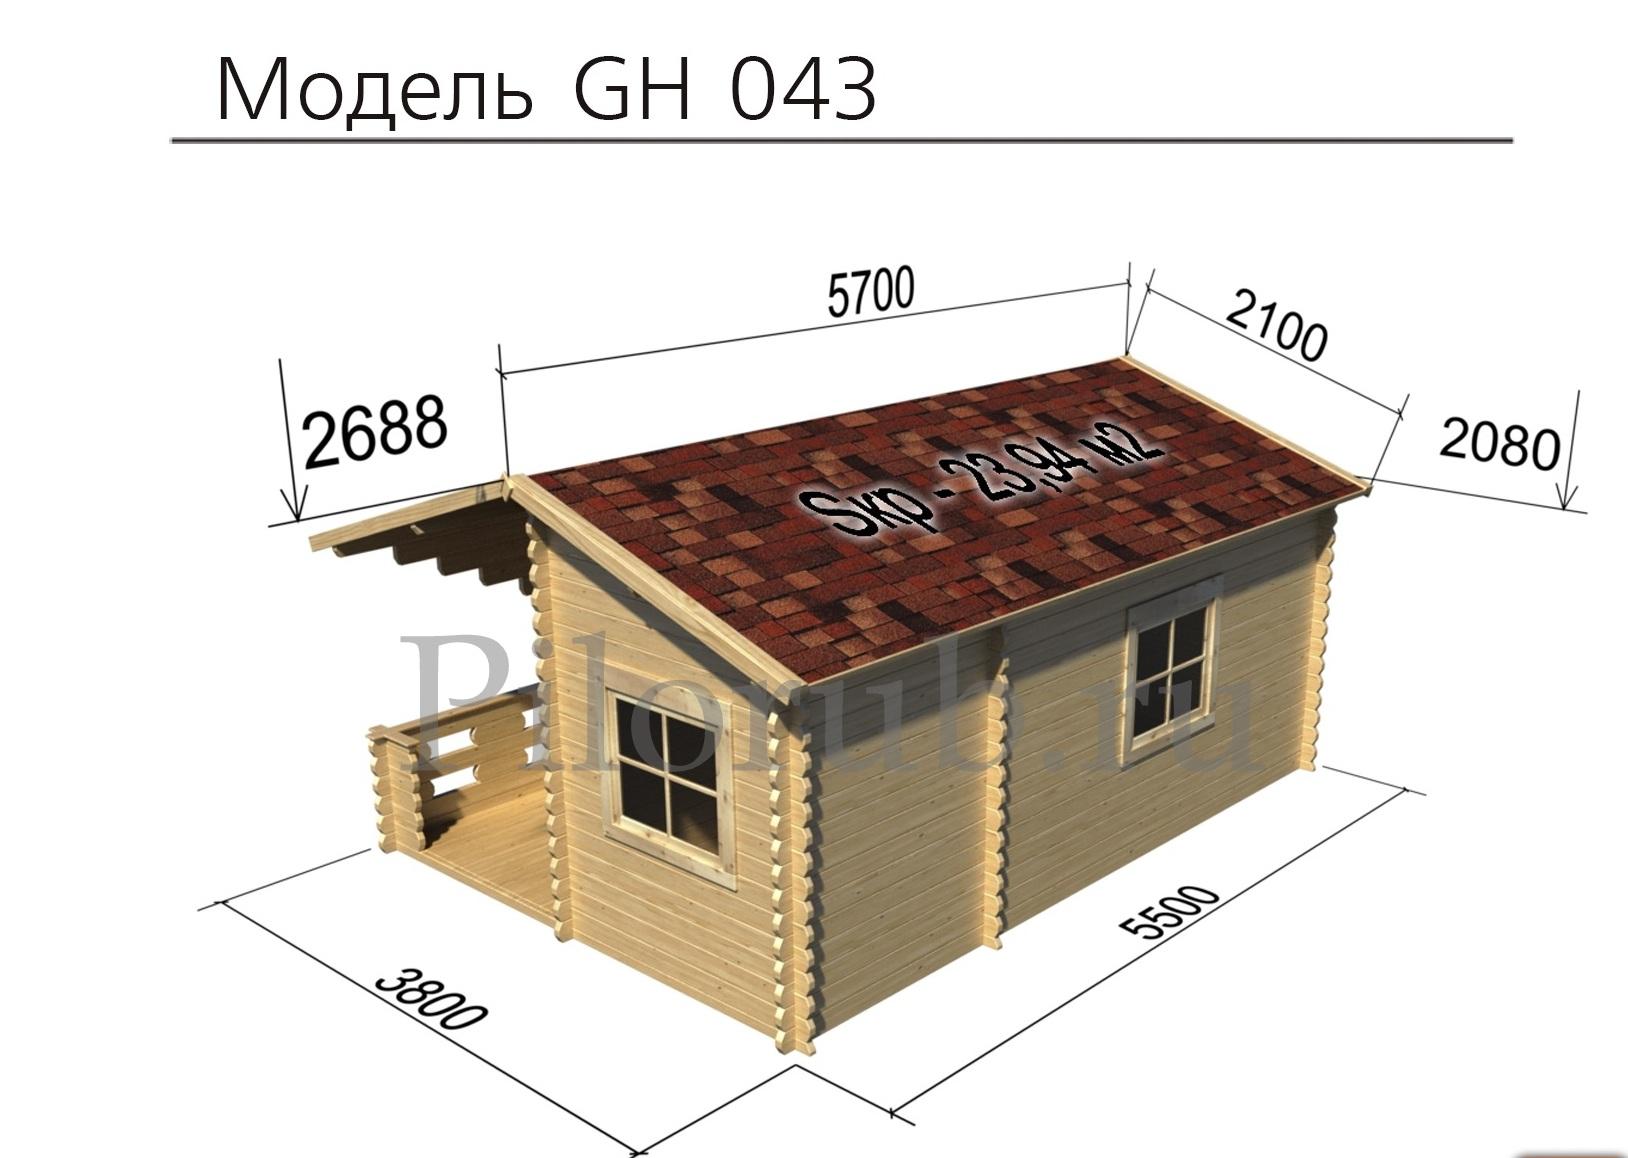 GH043